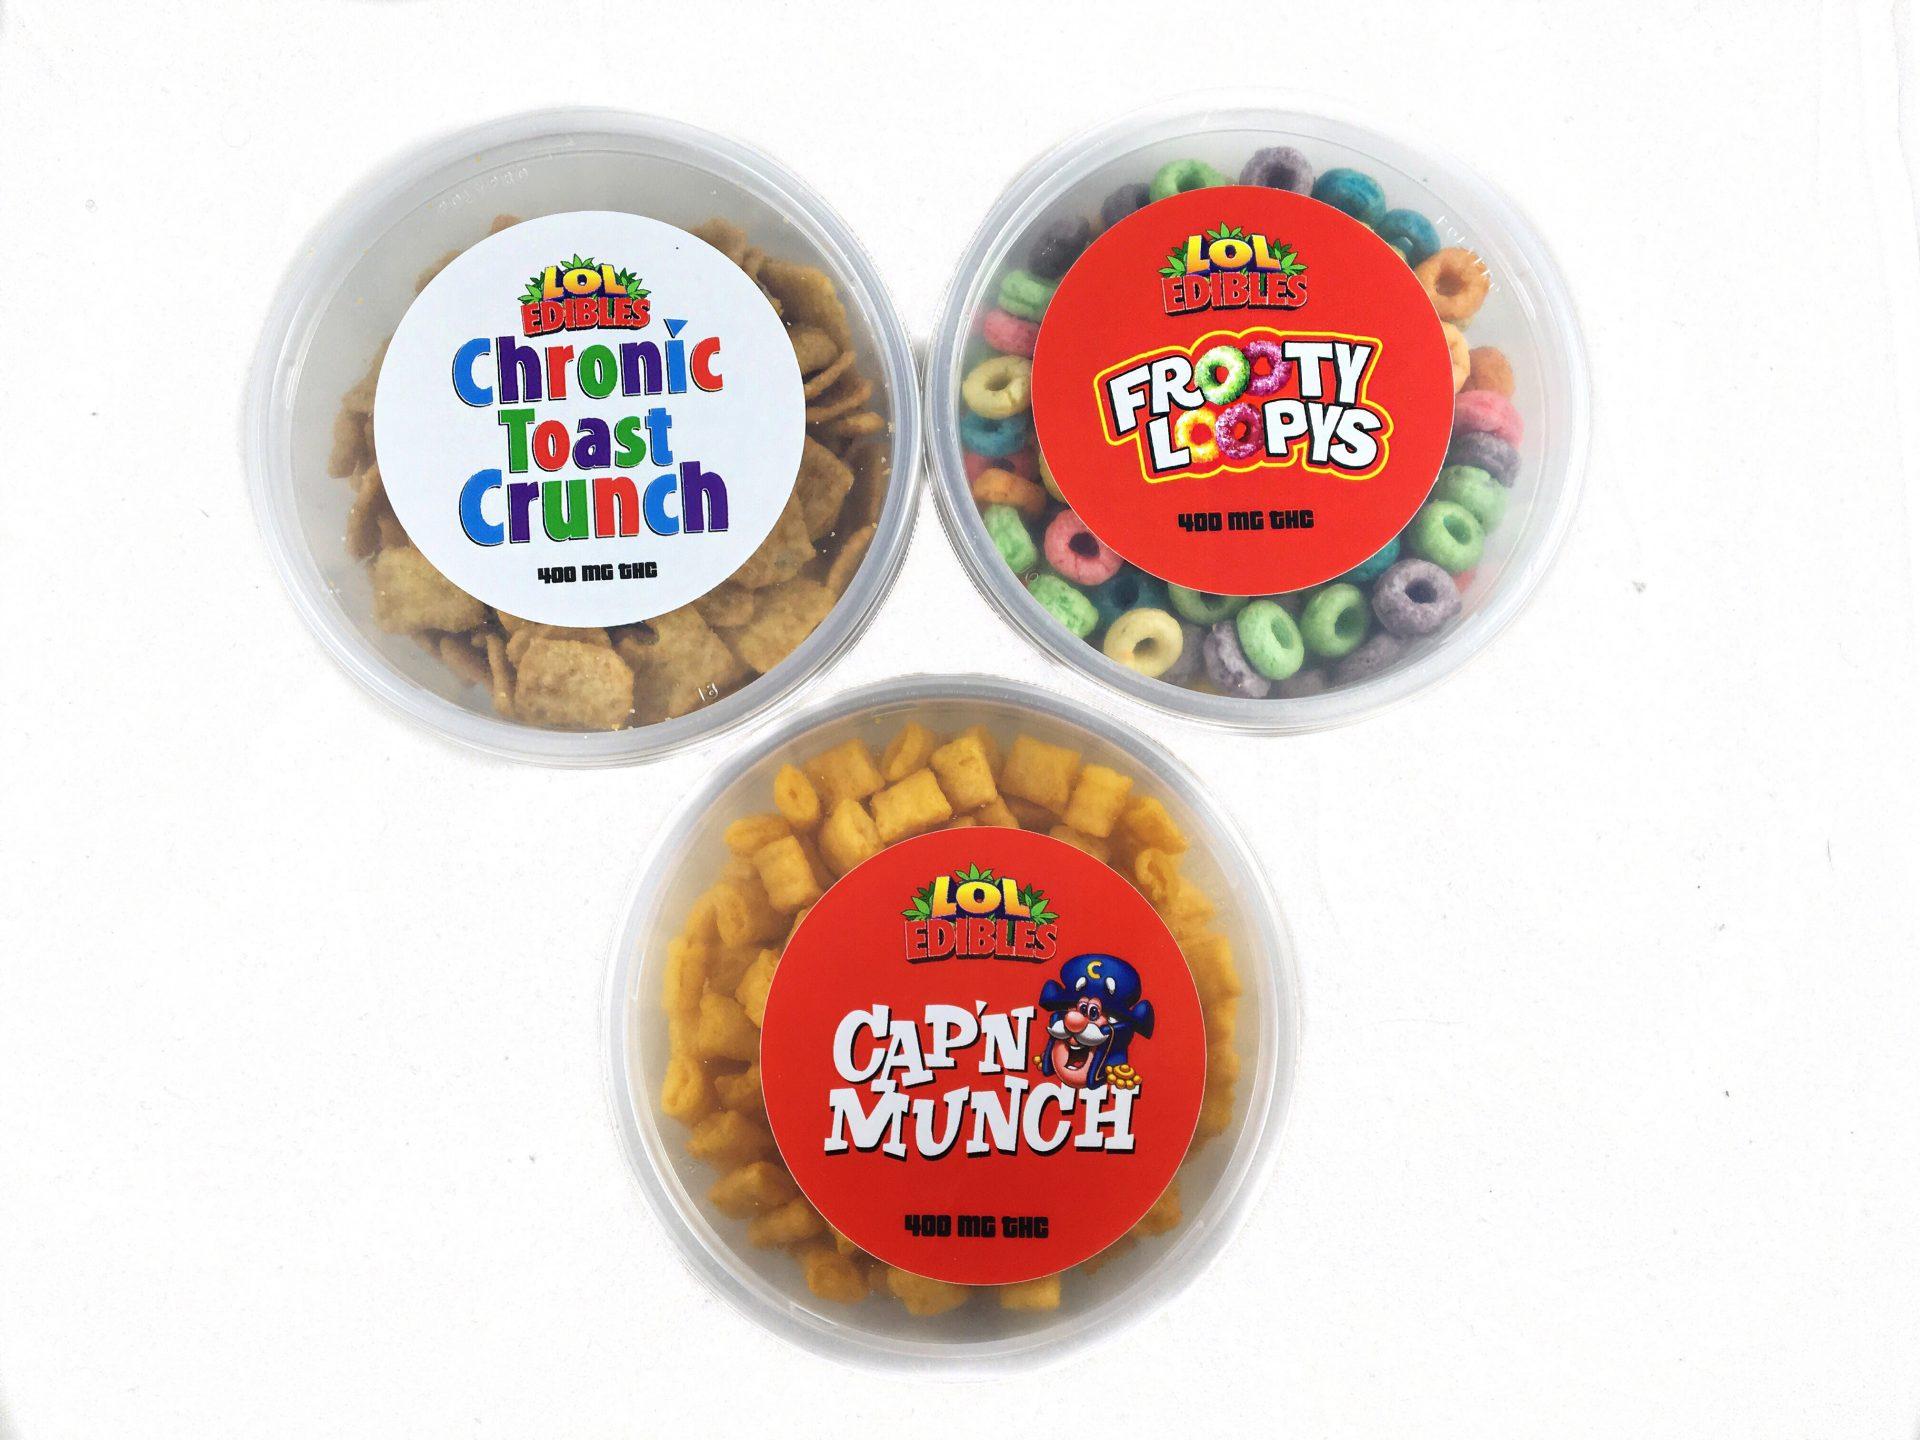 Lol pot cereal lol edibles 400mg thc 3 flavors bud man oc lol pot cereal lol edibles ccuart Image collections